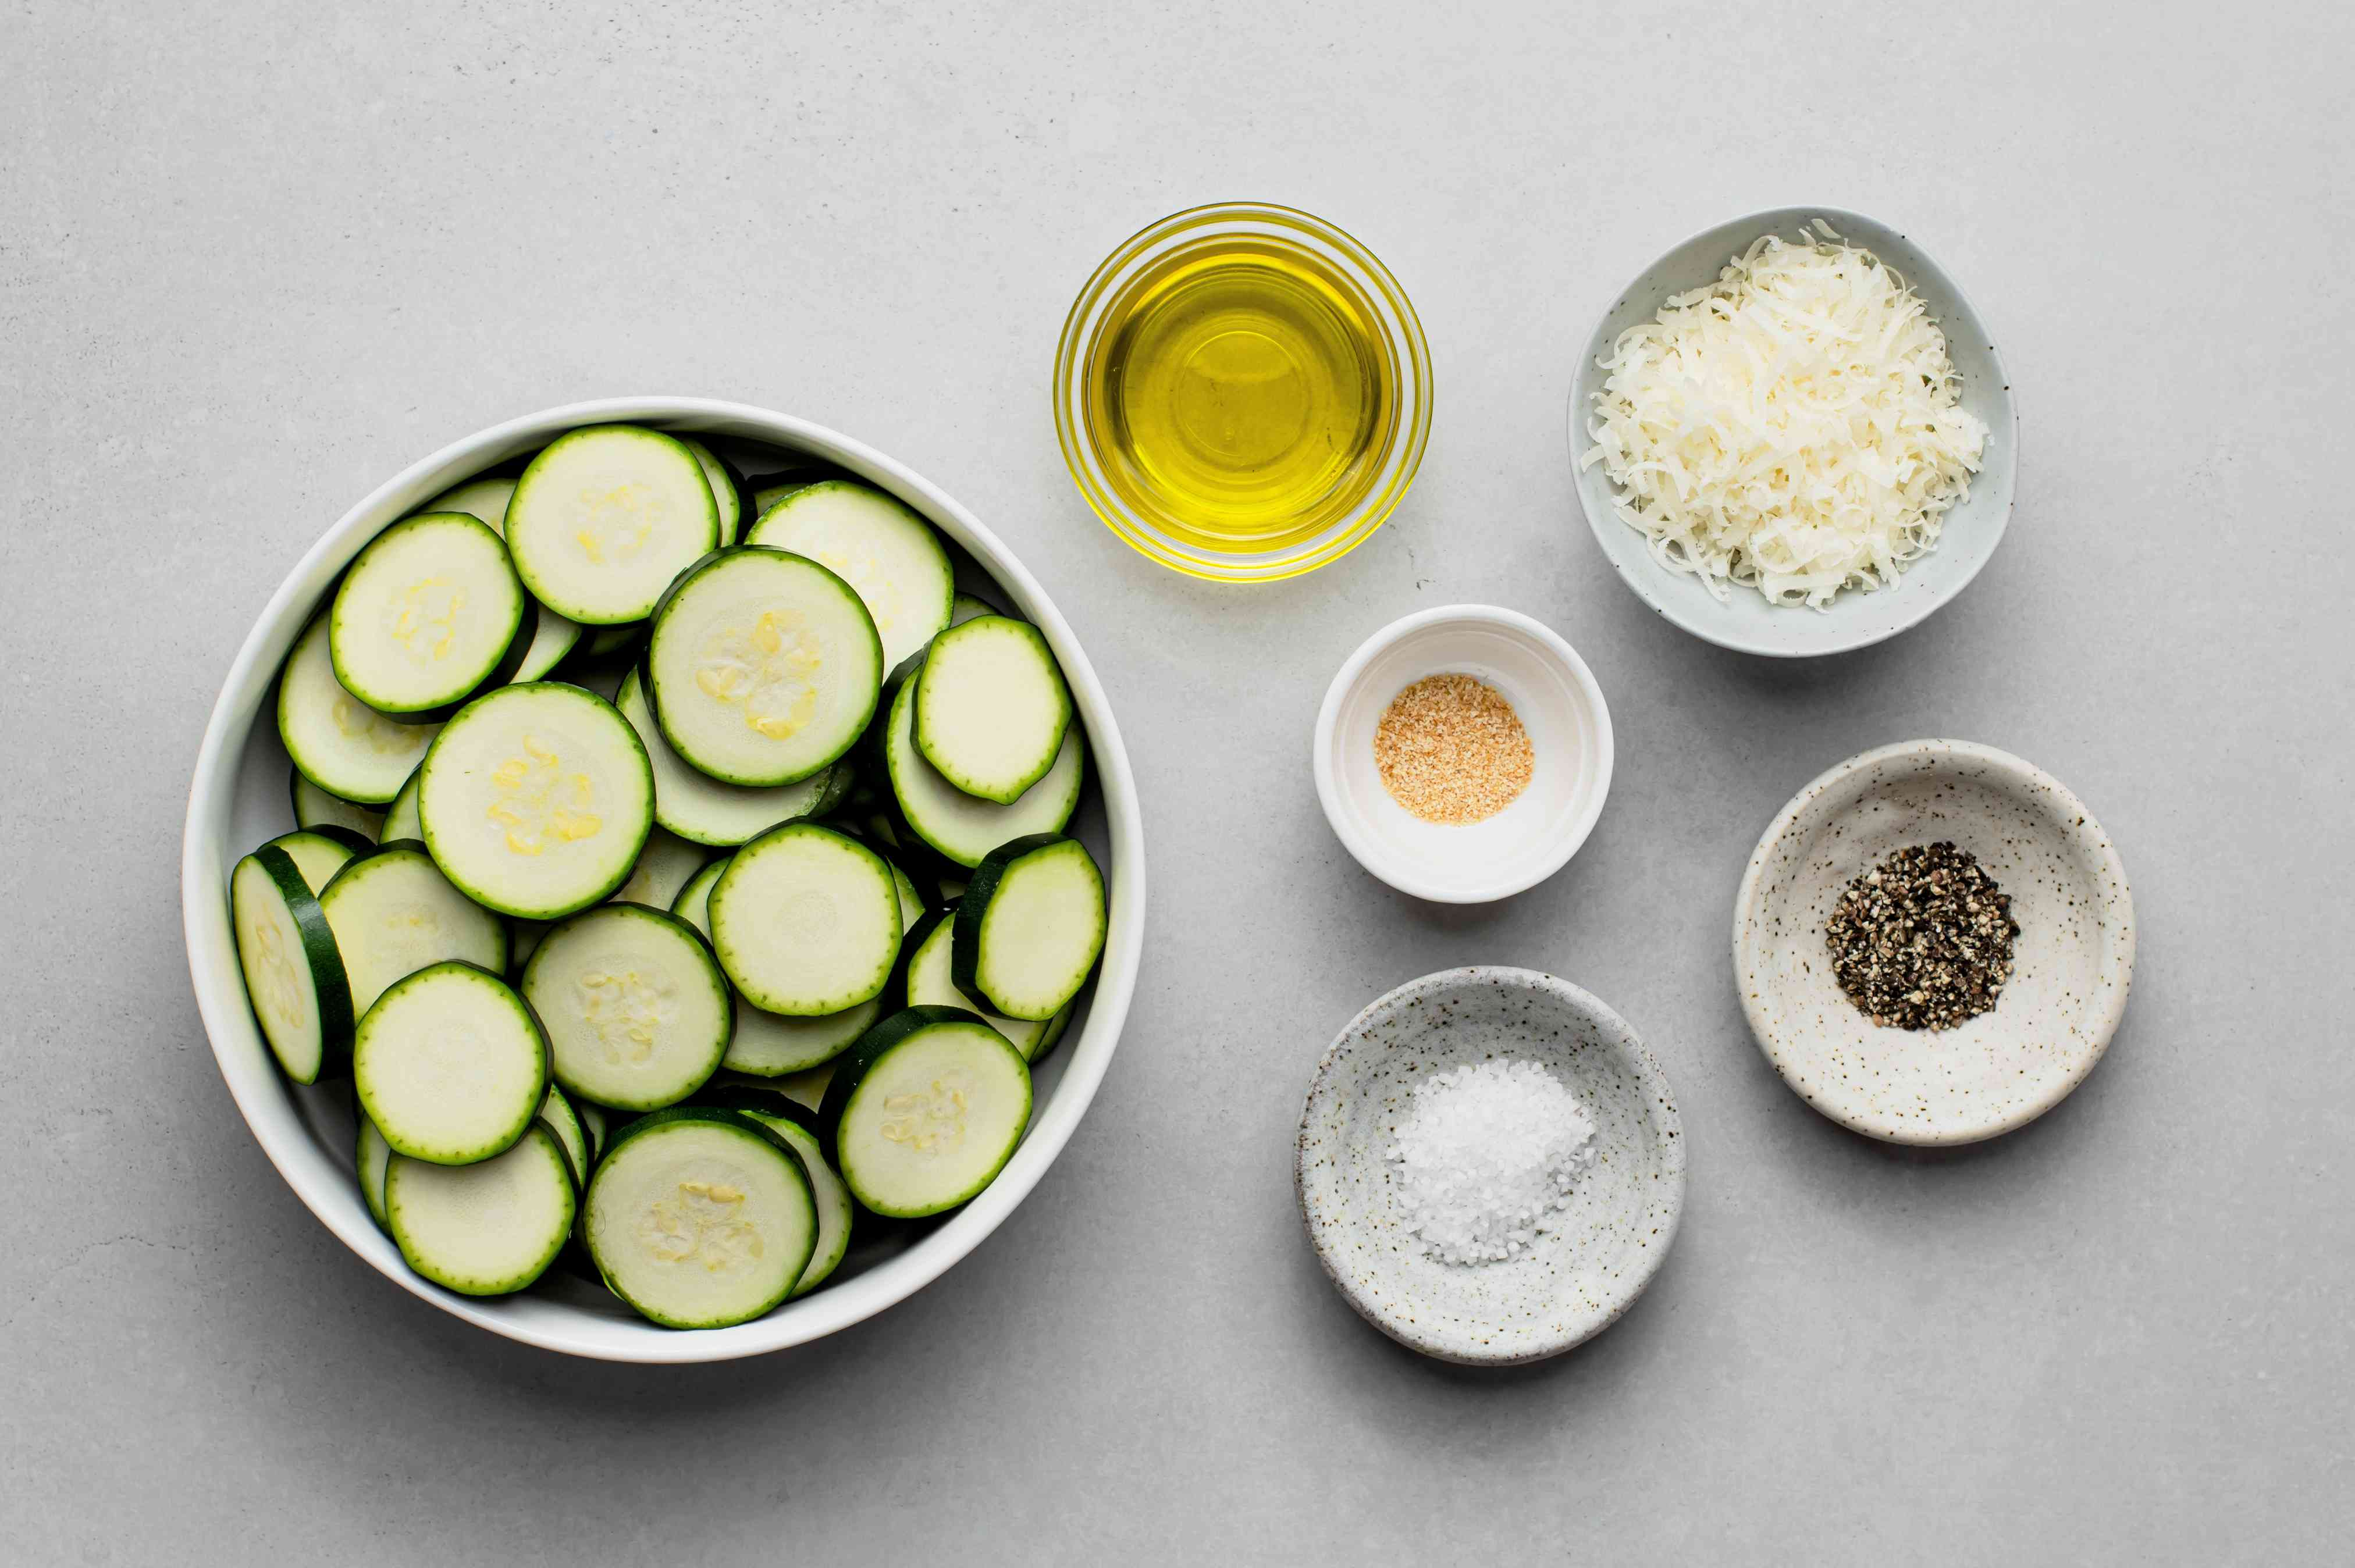 Sautéed Zucchini ingredients